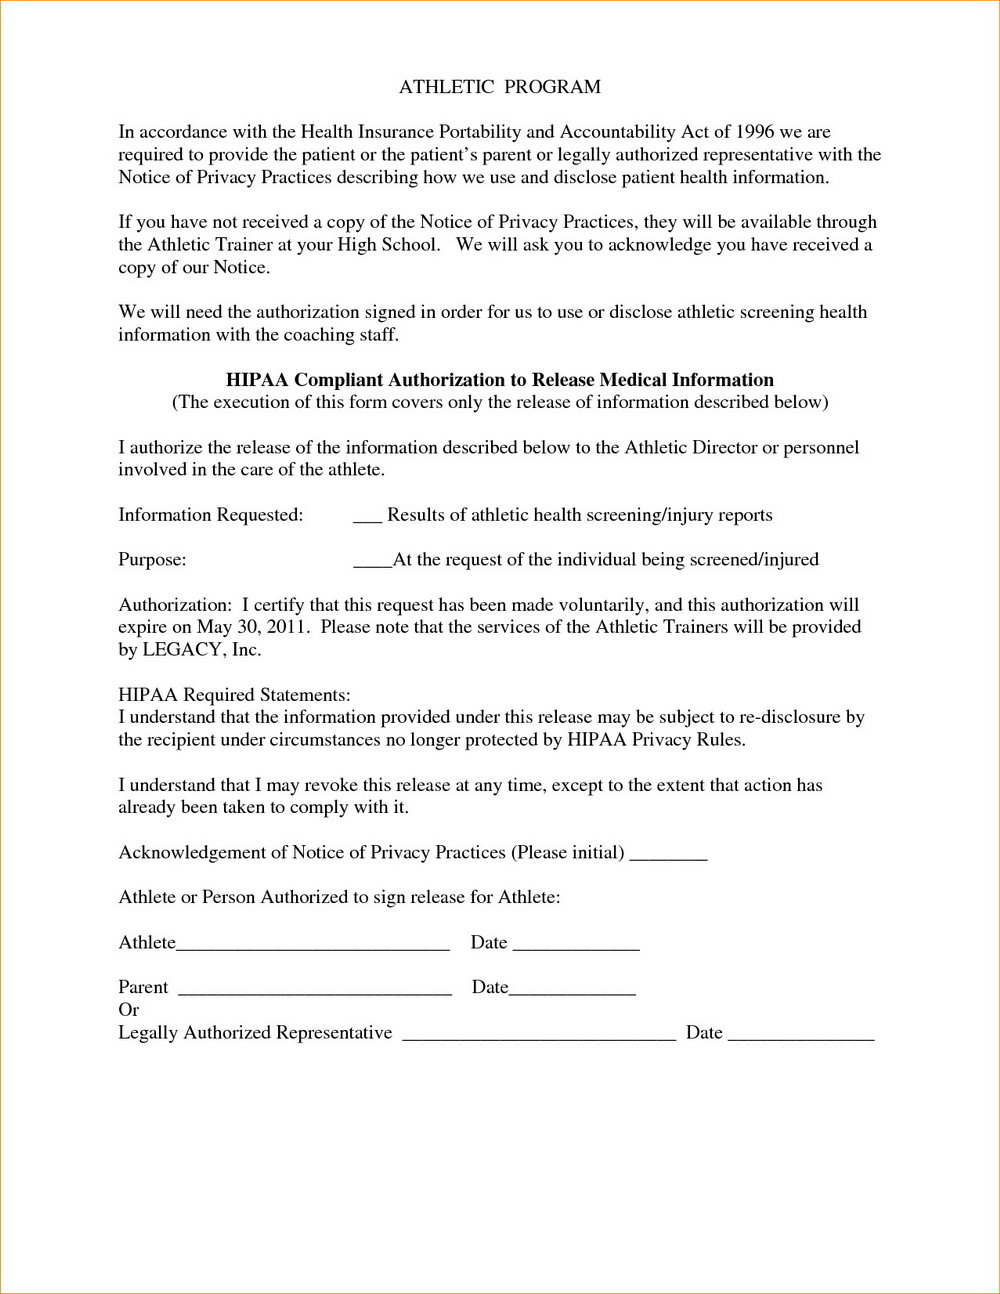 Hipaa Compliant Release Form California